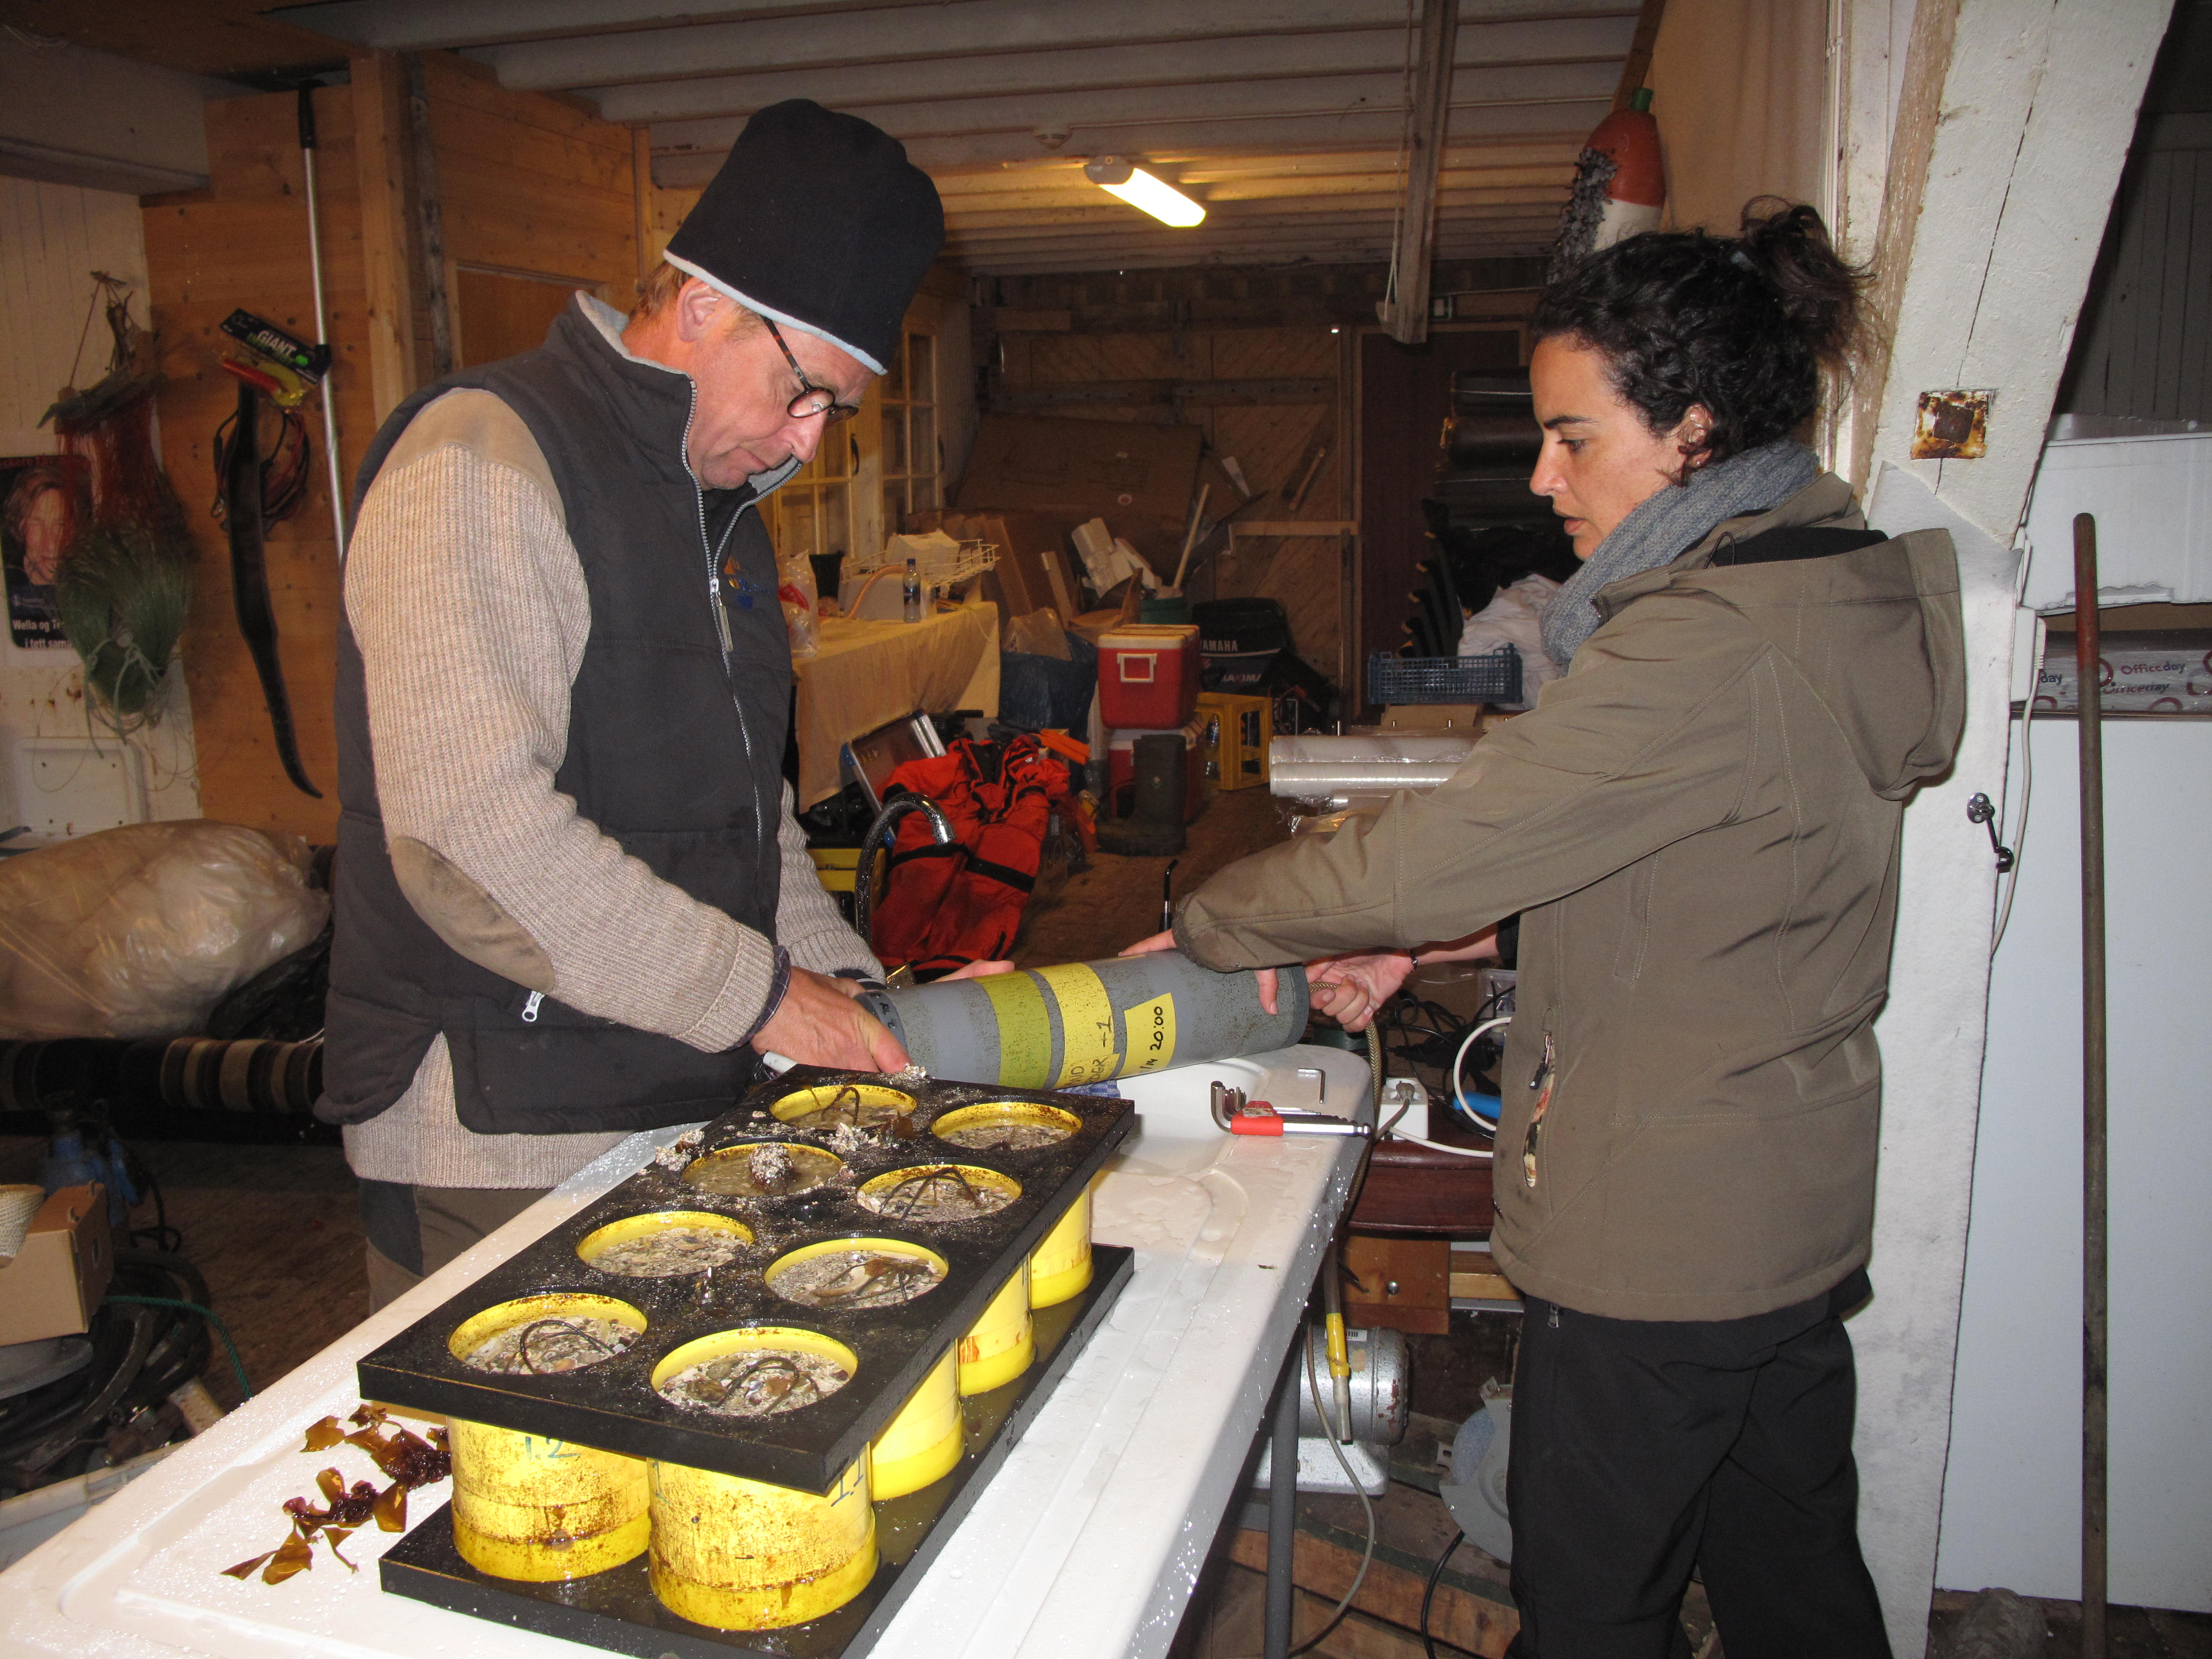 Rob and Irene prepare the lander equipment